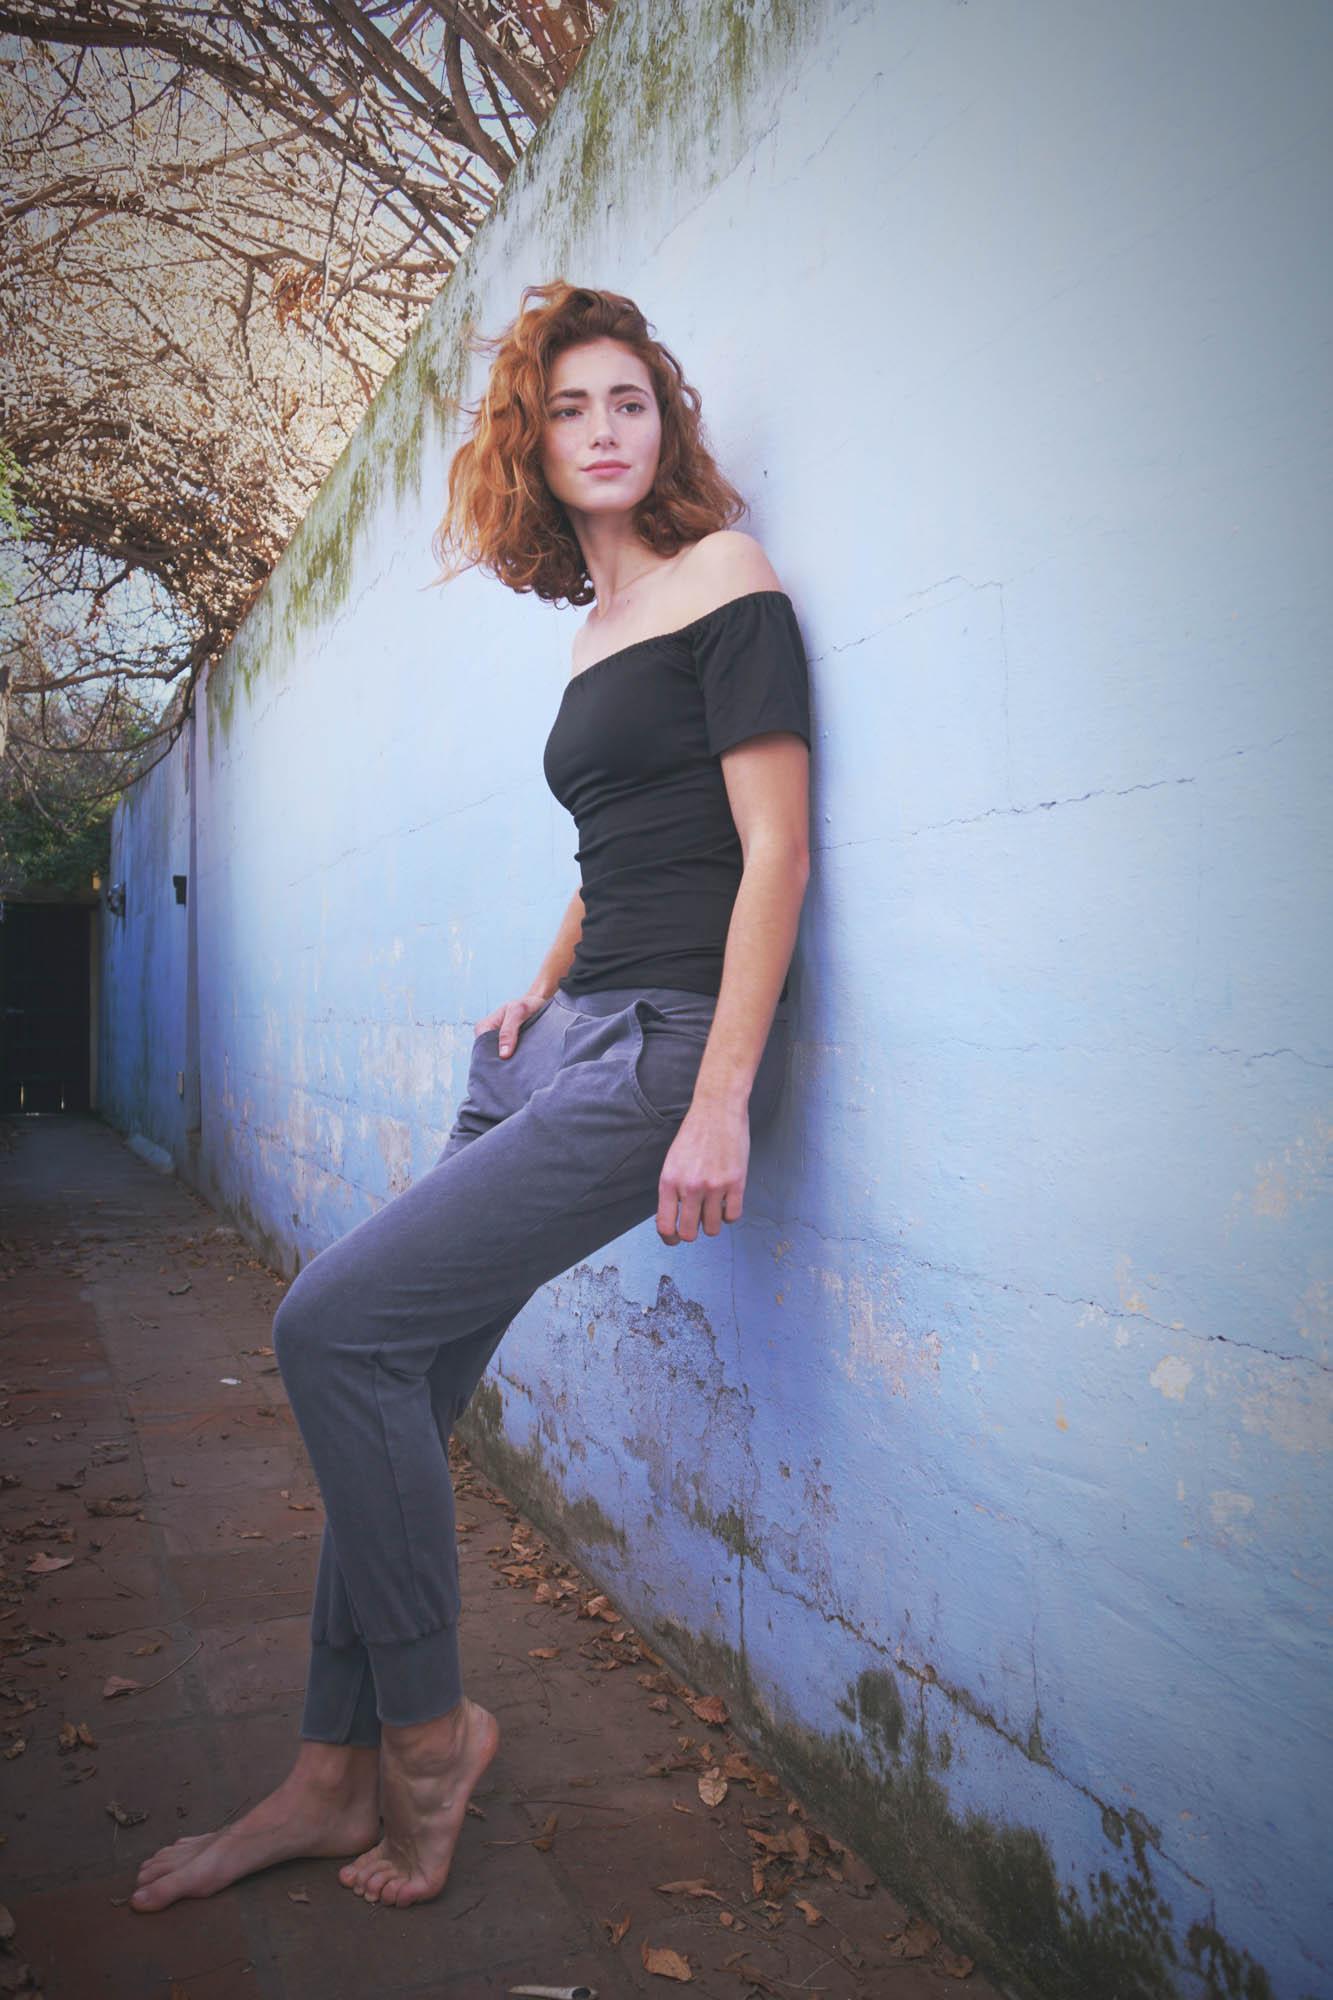 Maria Malo black t-shirt and yoga pants